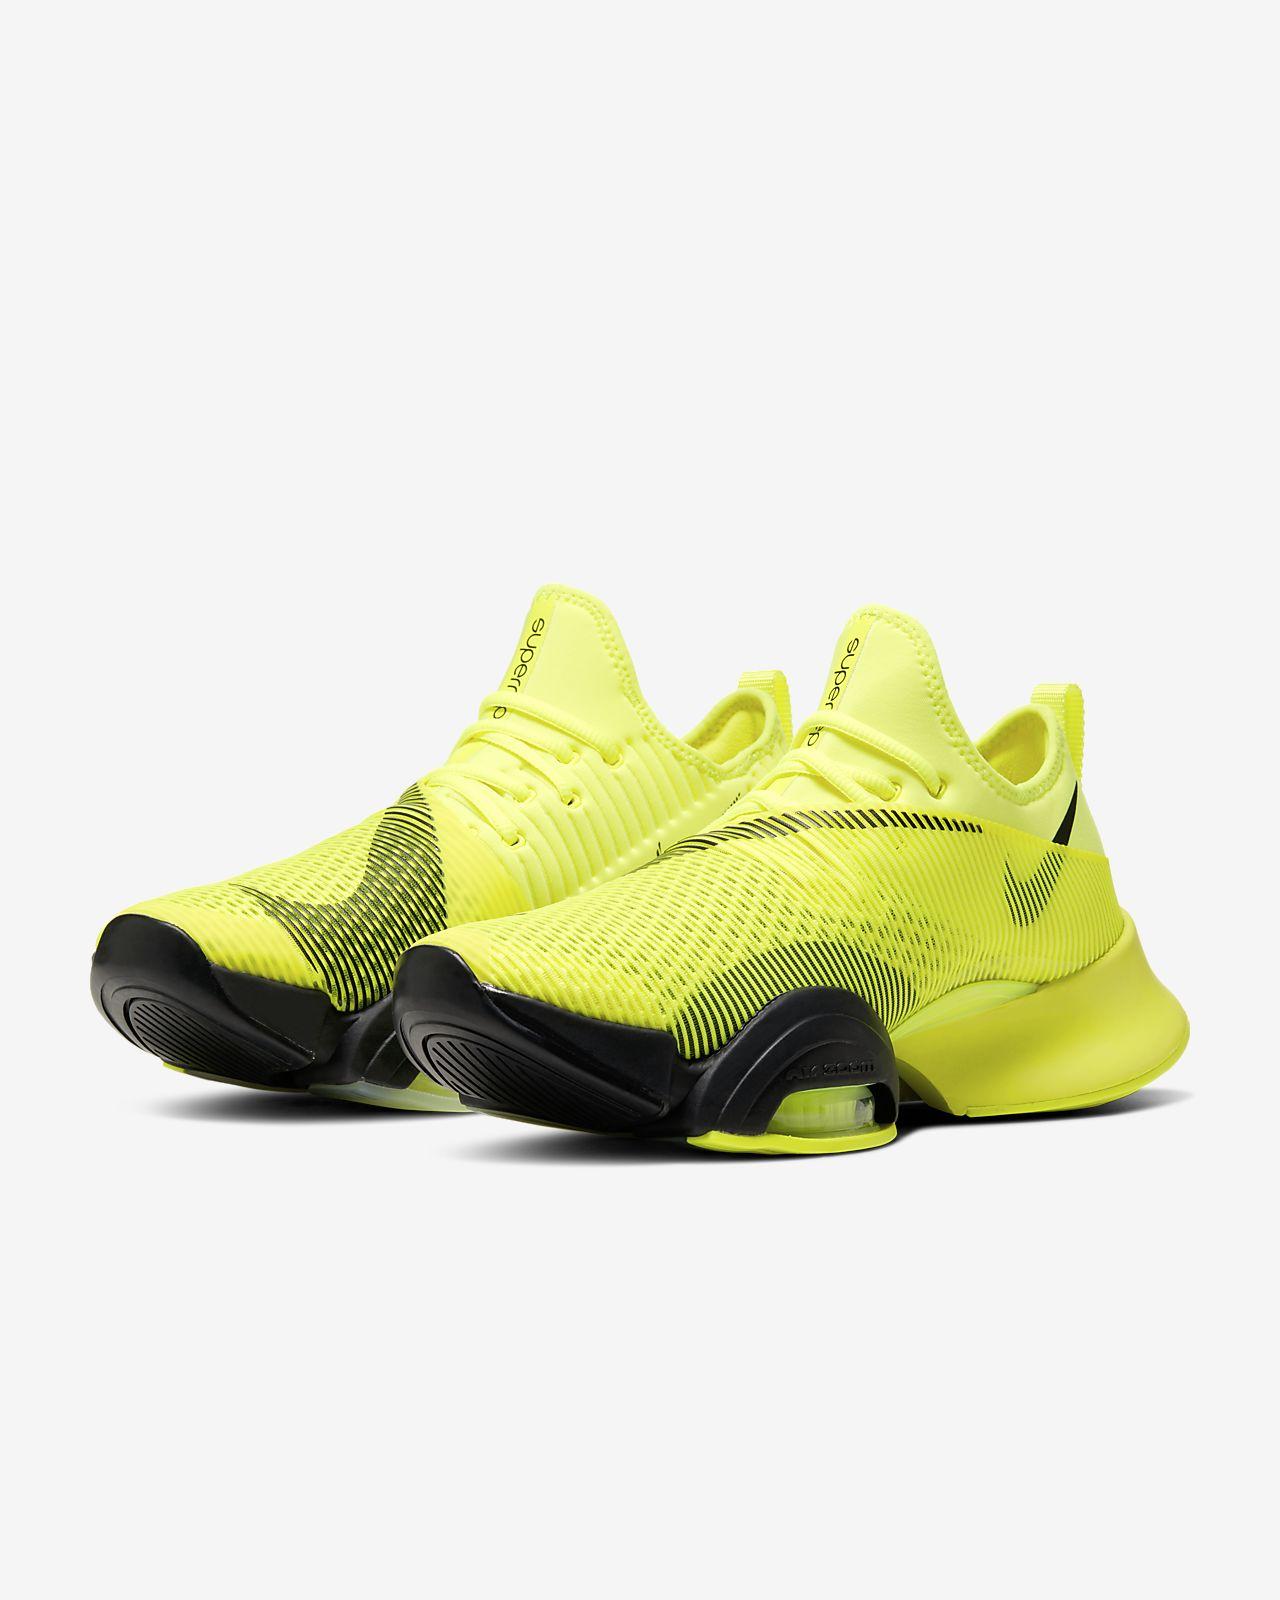 Tenis Nike Air Max Defy RN Promoção !!! | Facebook